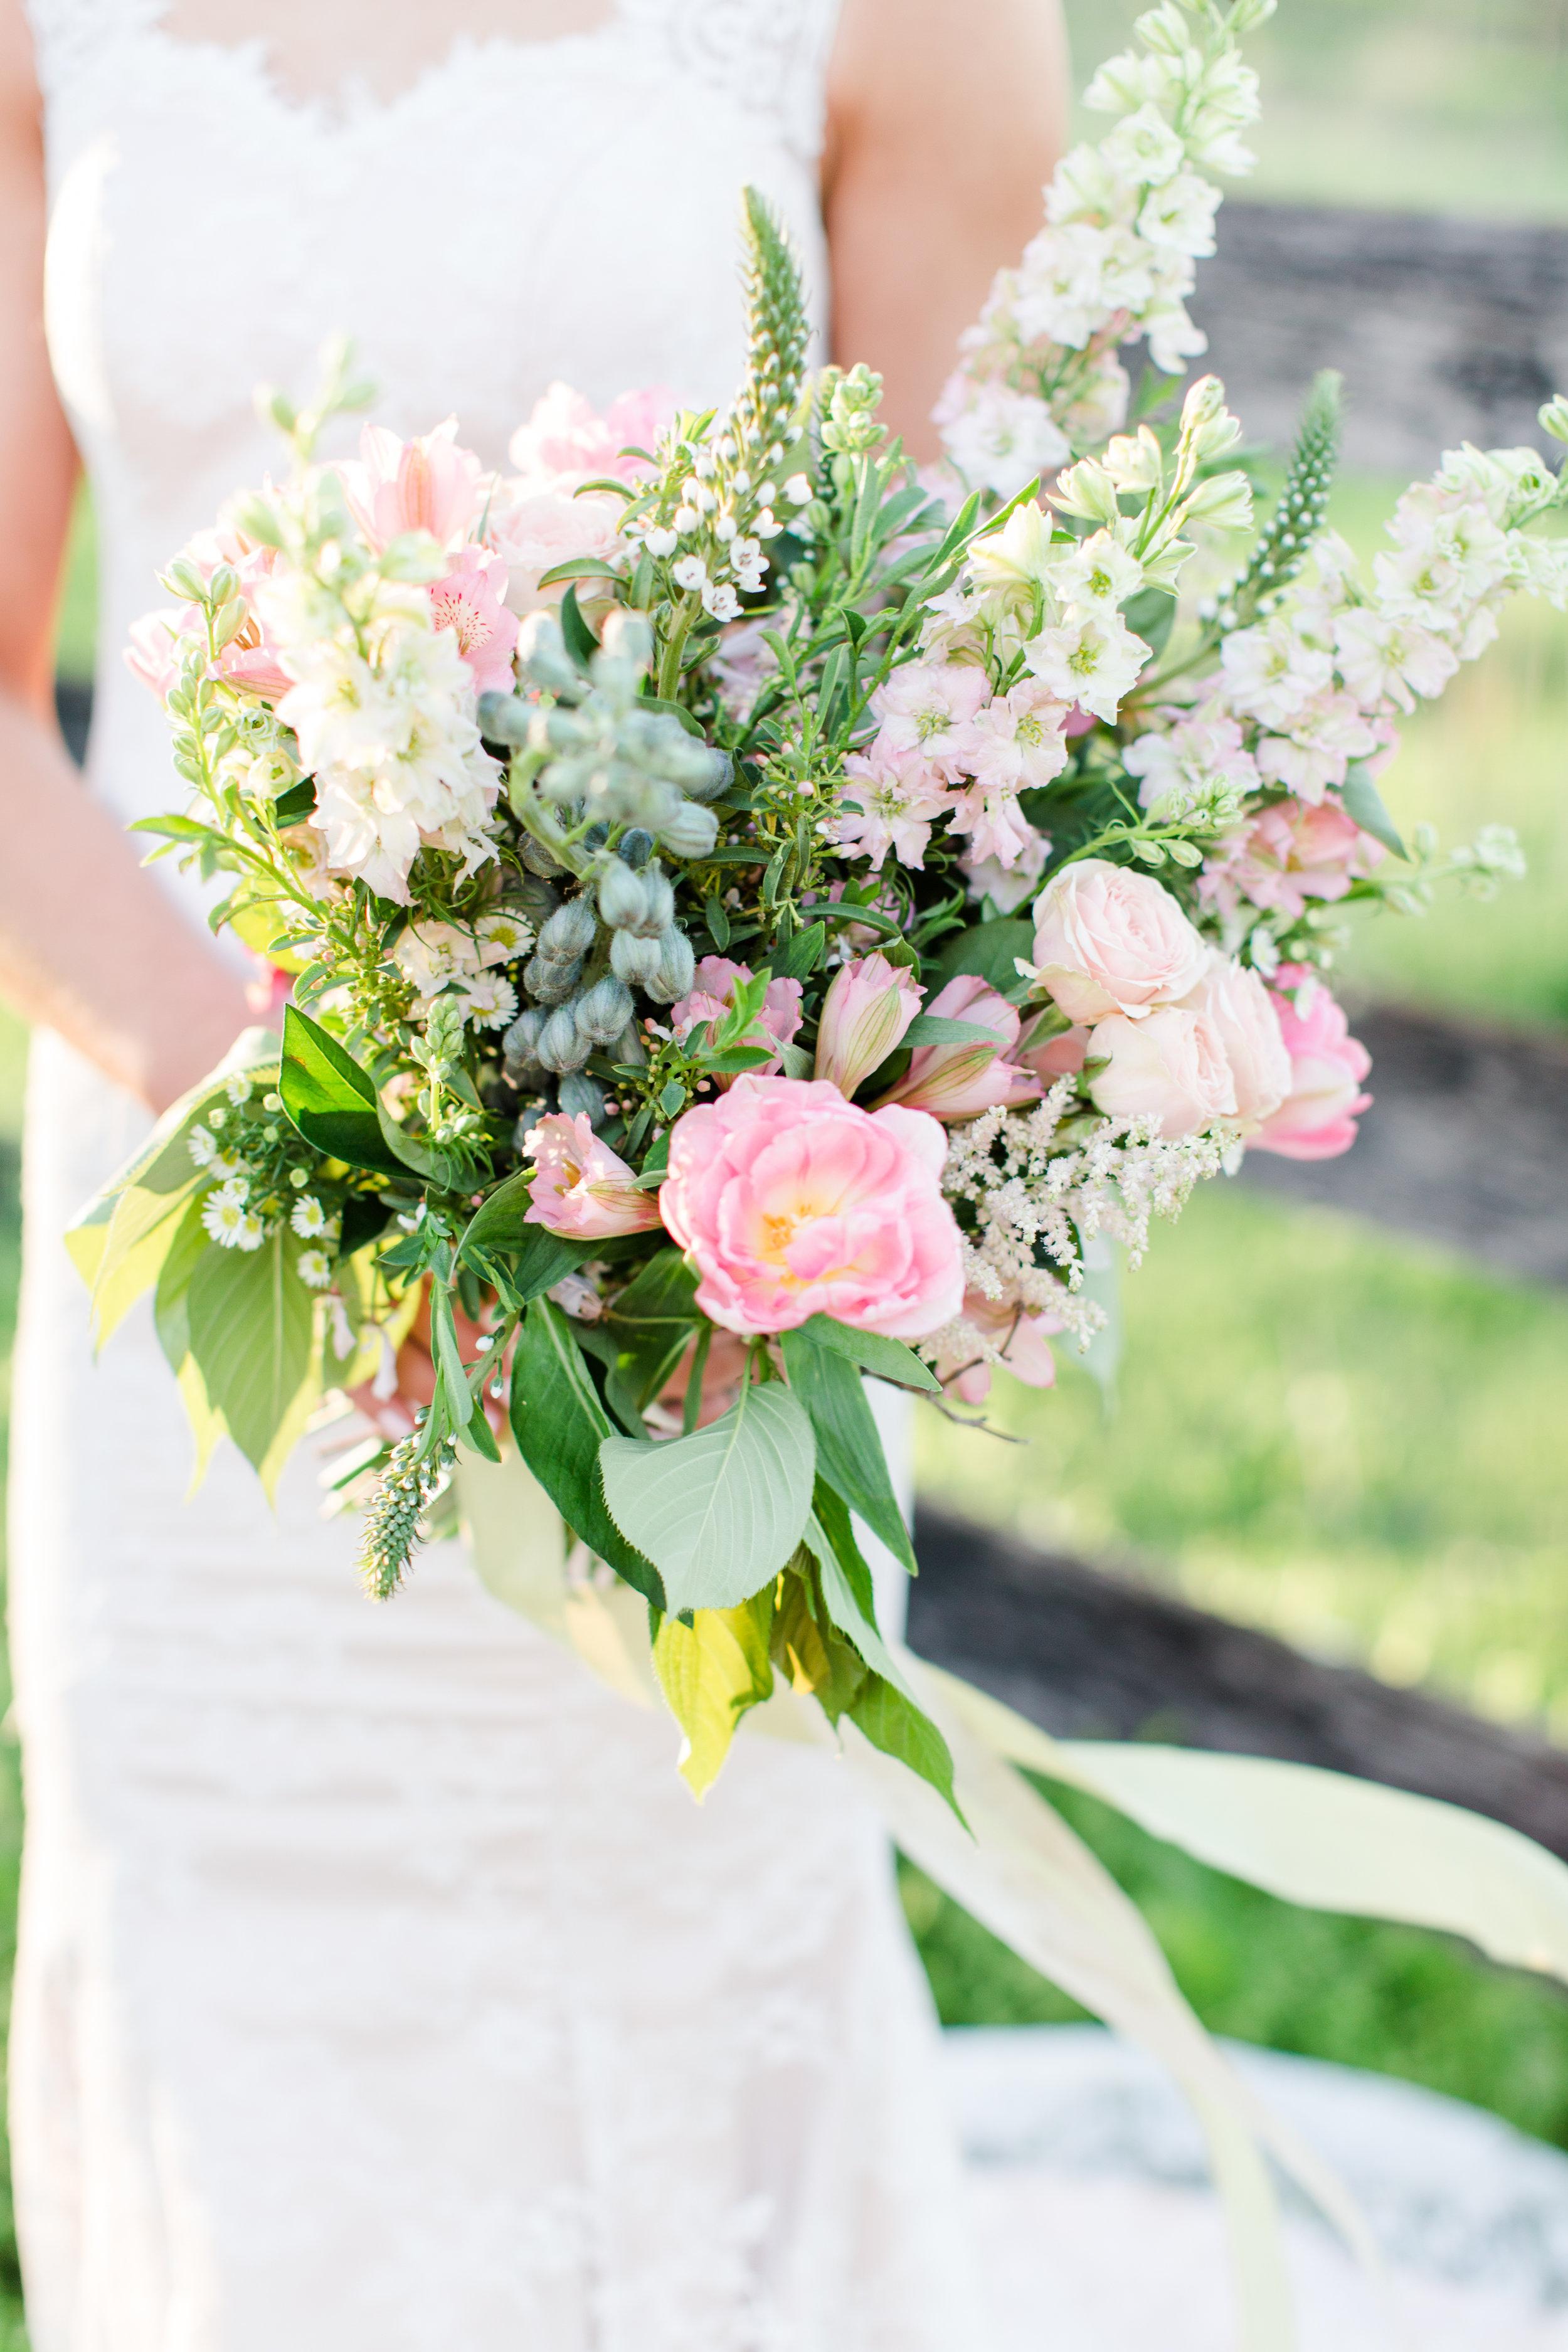 tranquility-farm-purcellville-va-blush-greenery-boho-elegance-wedding-inspiration-bethanne-arthur-photography-photos-182.jpg